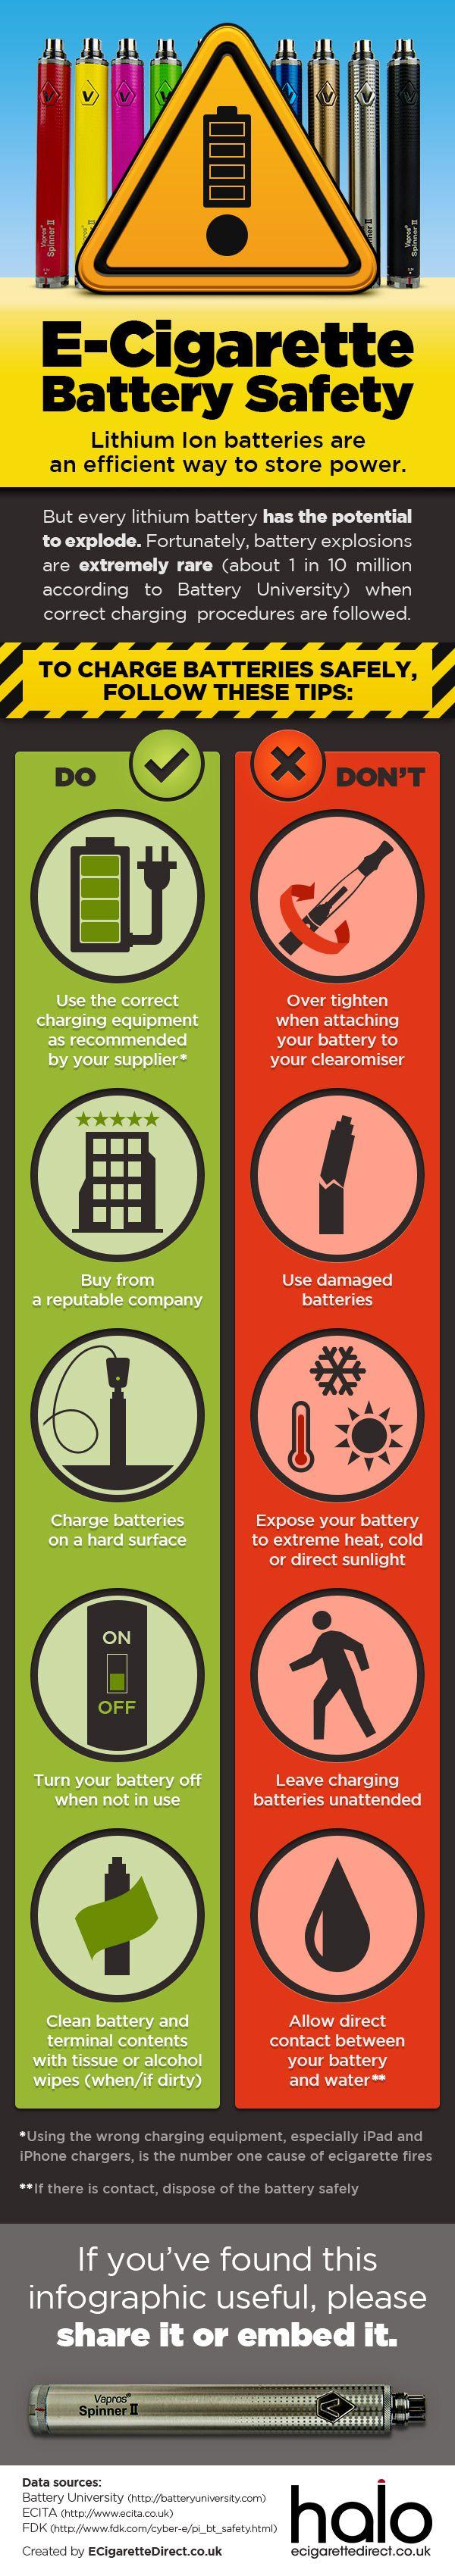 Prevent exploding e-cigarette batteries